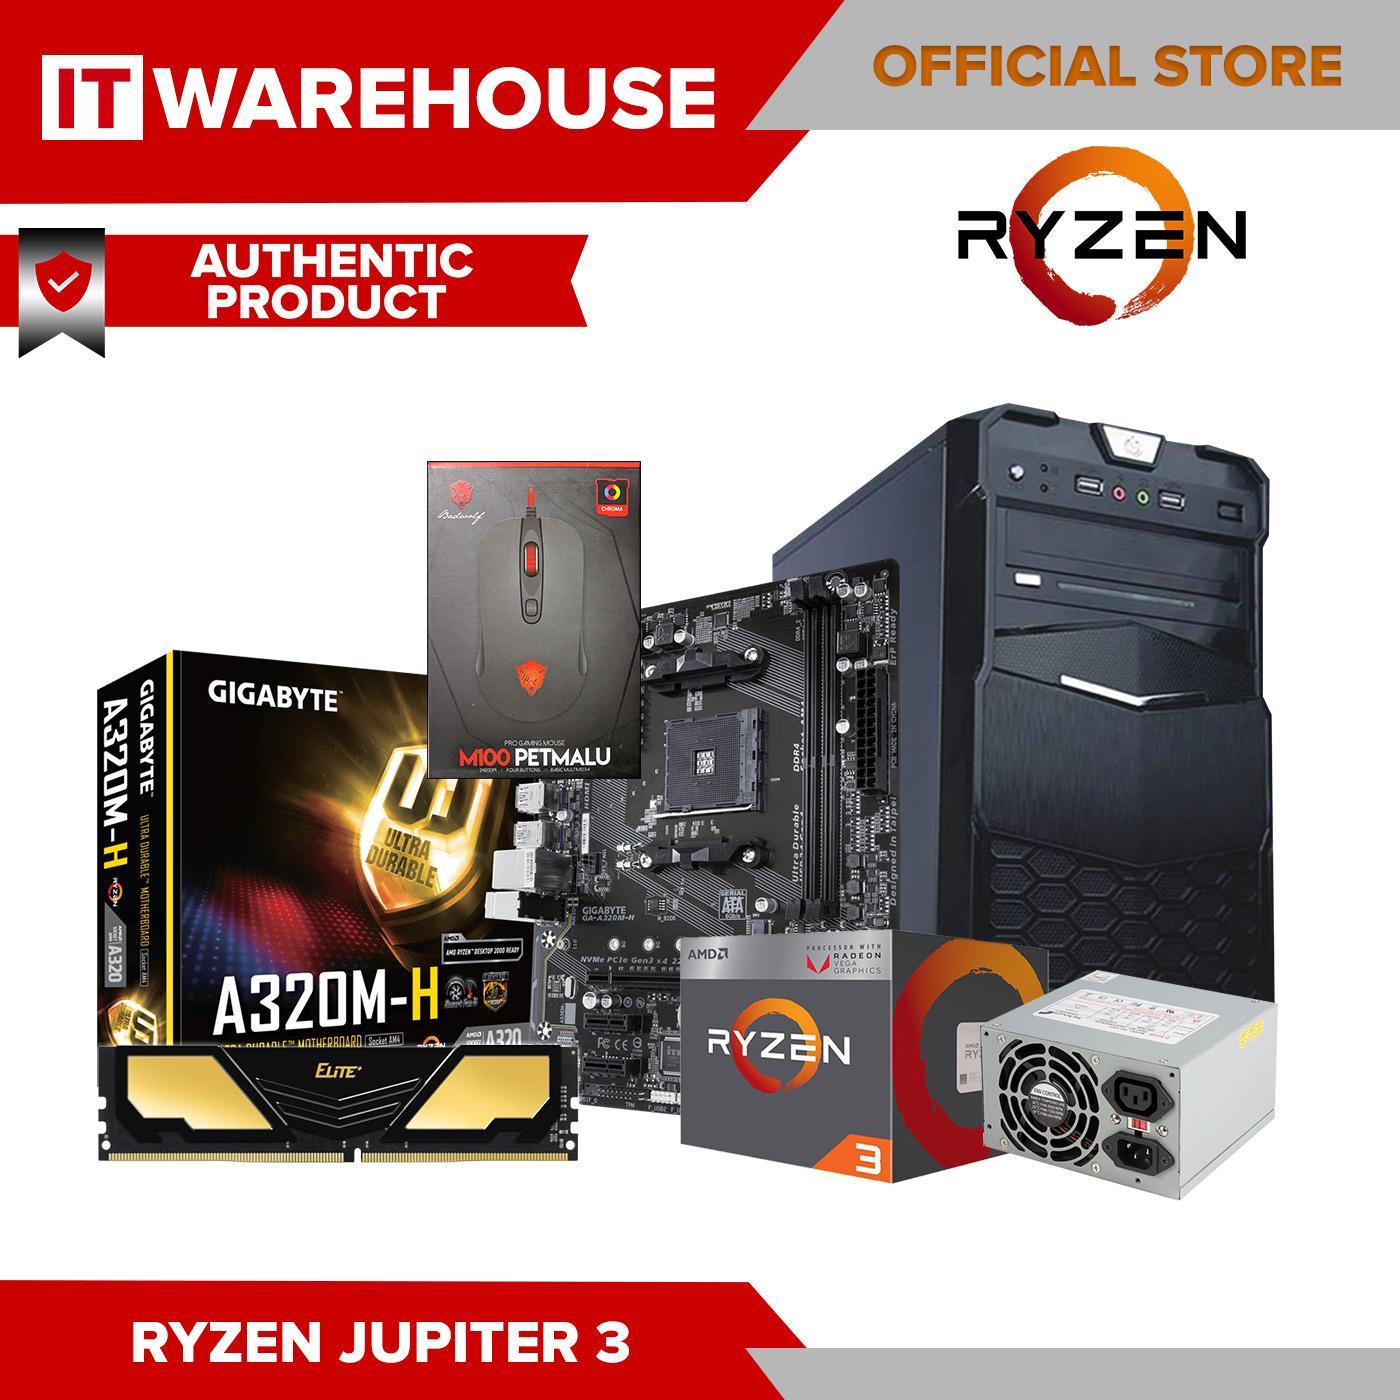 AMD Ryzen 3 2200G RYZ 3 VEGA JUPITER 3 System Package Quad-Core 3 5 GHz  Socket AM4 65W with Radeon Vega 8 Graphics iGPU Desktop Processor DISKLESS